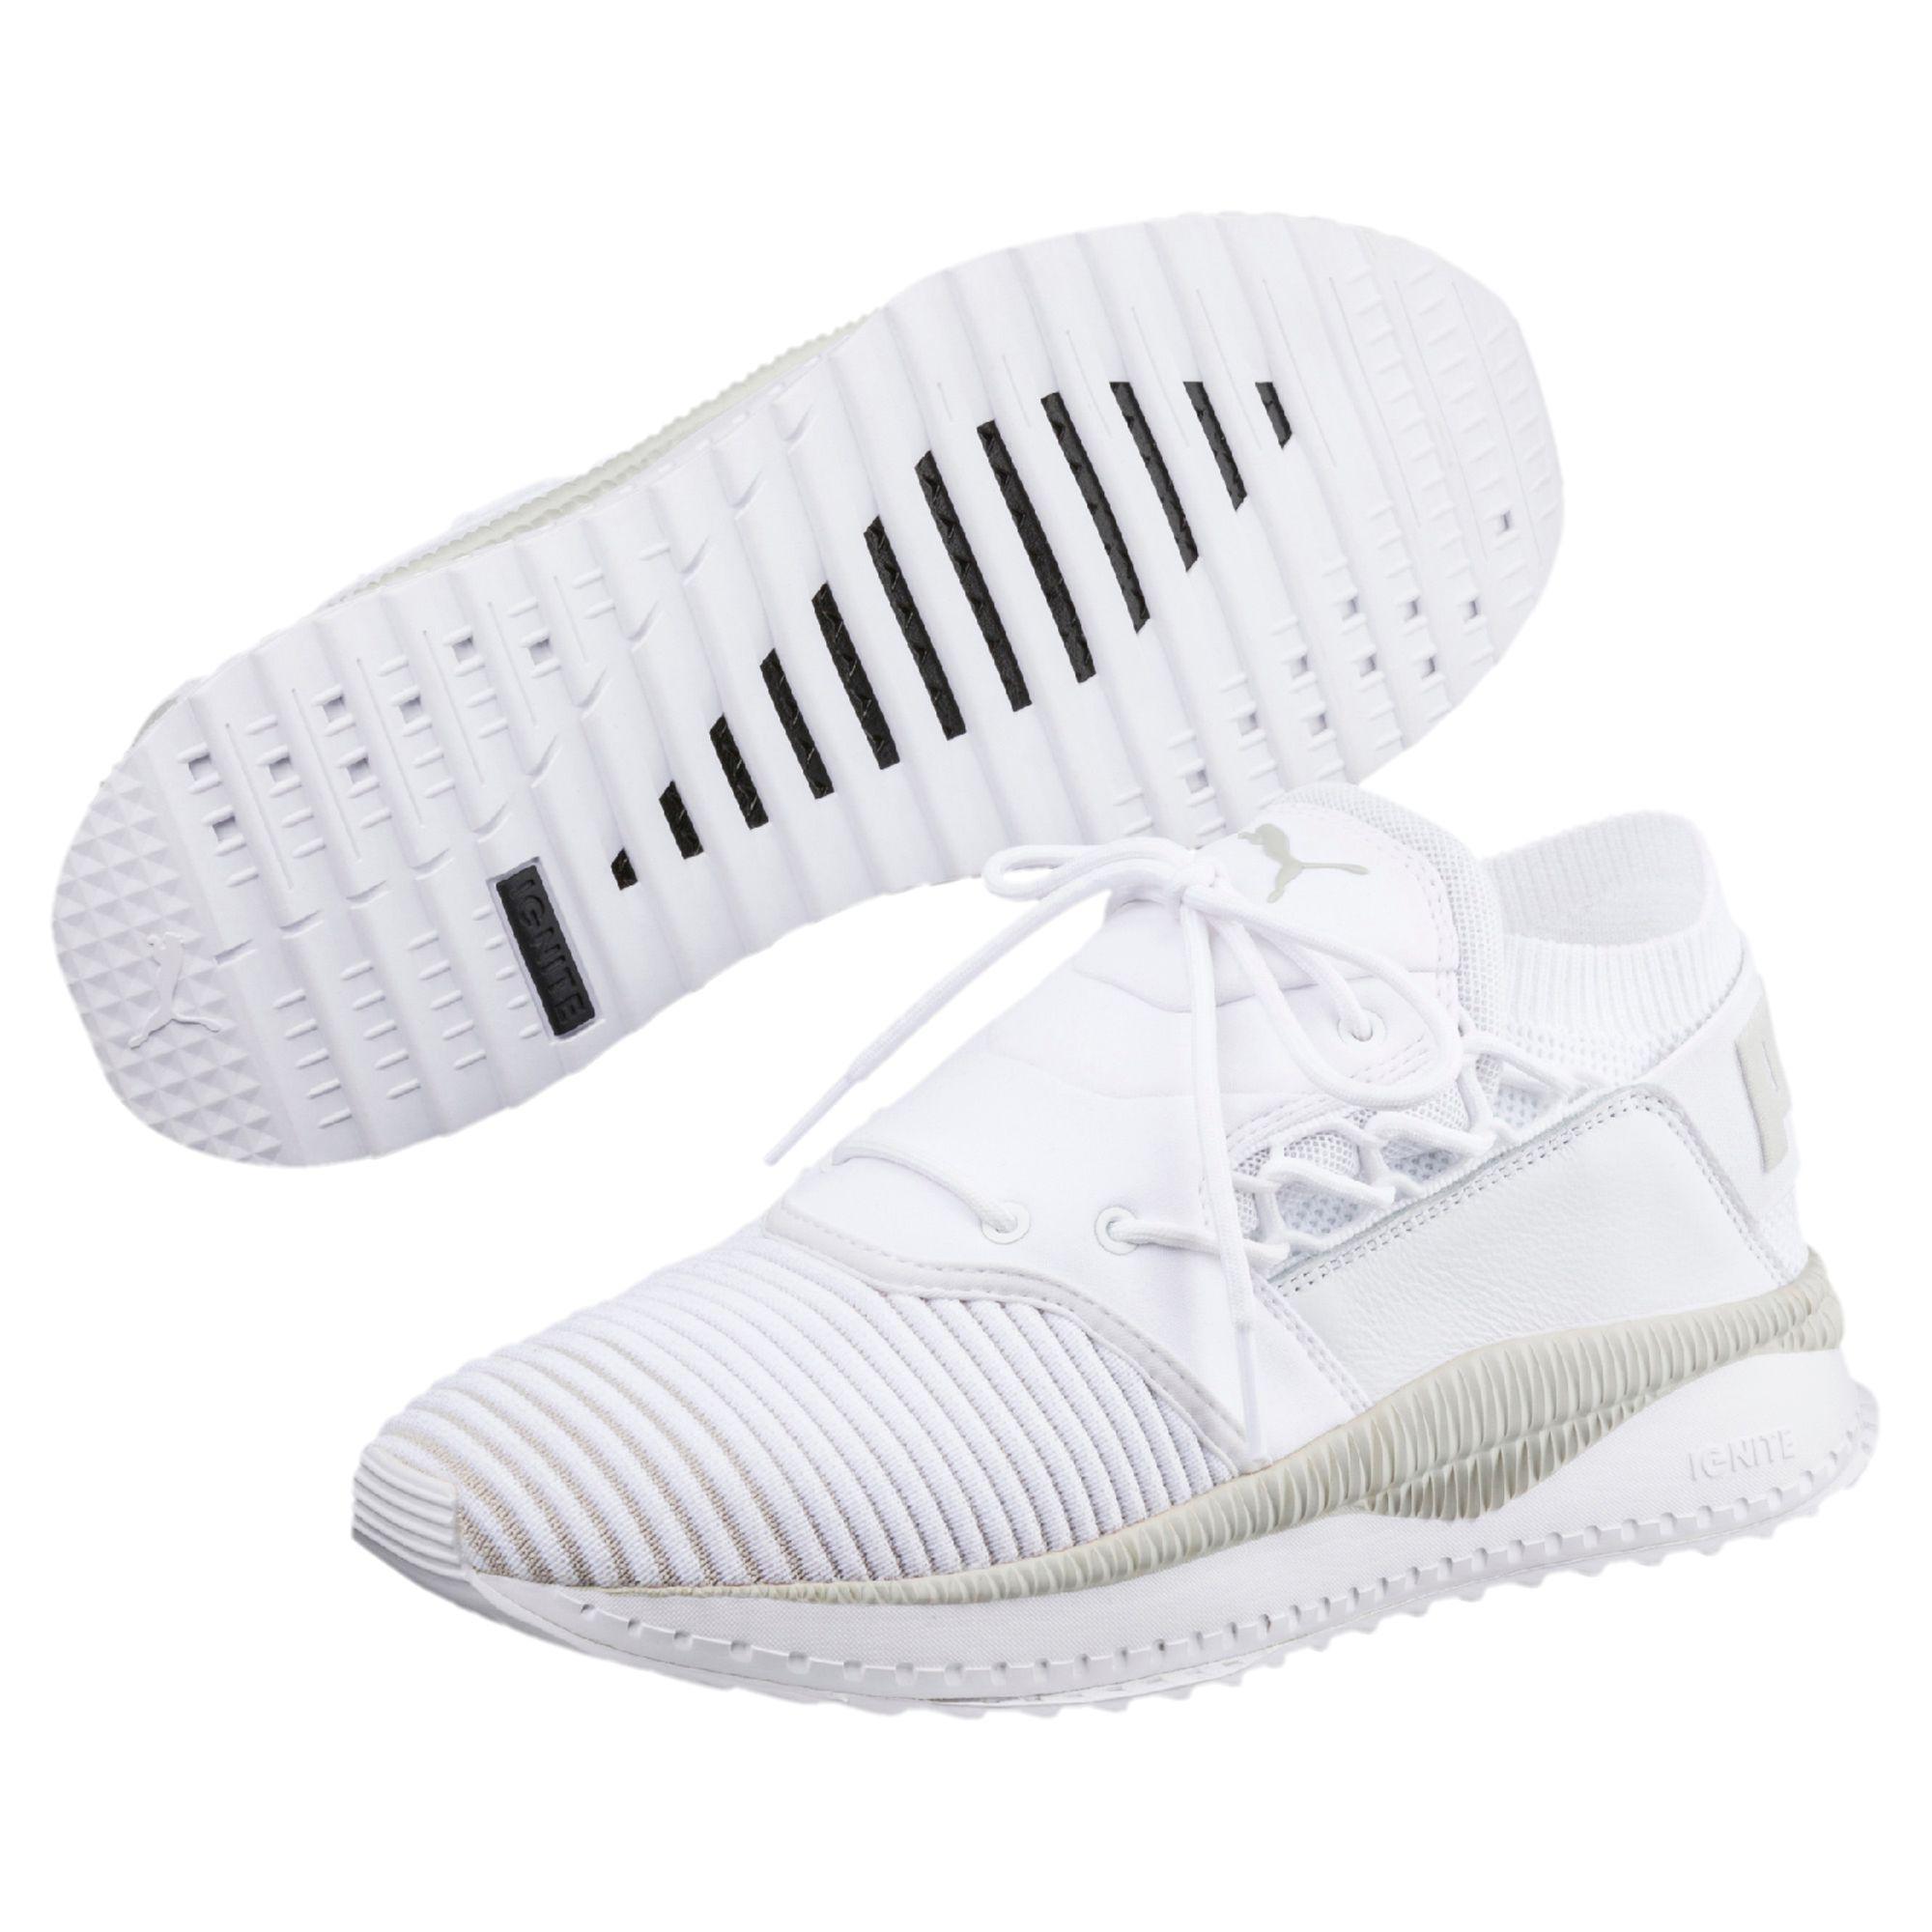 Lyst - PUMA Tsugi Shinsei Evoknit Sneakers for Men c19a5deba